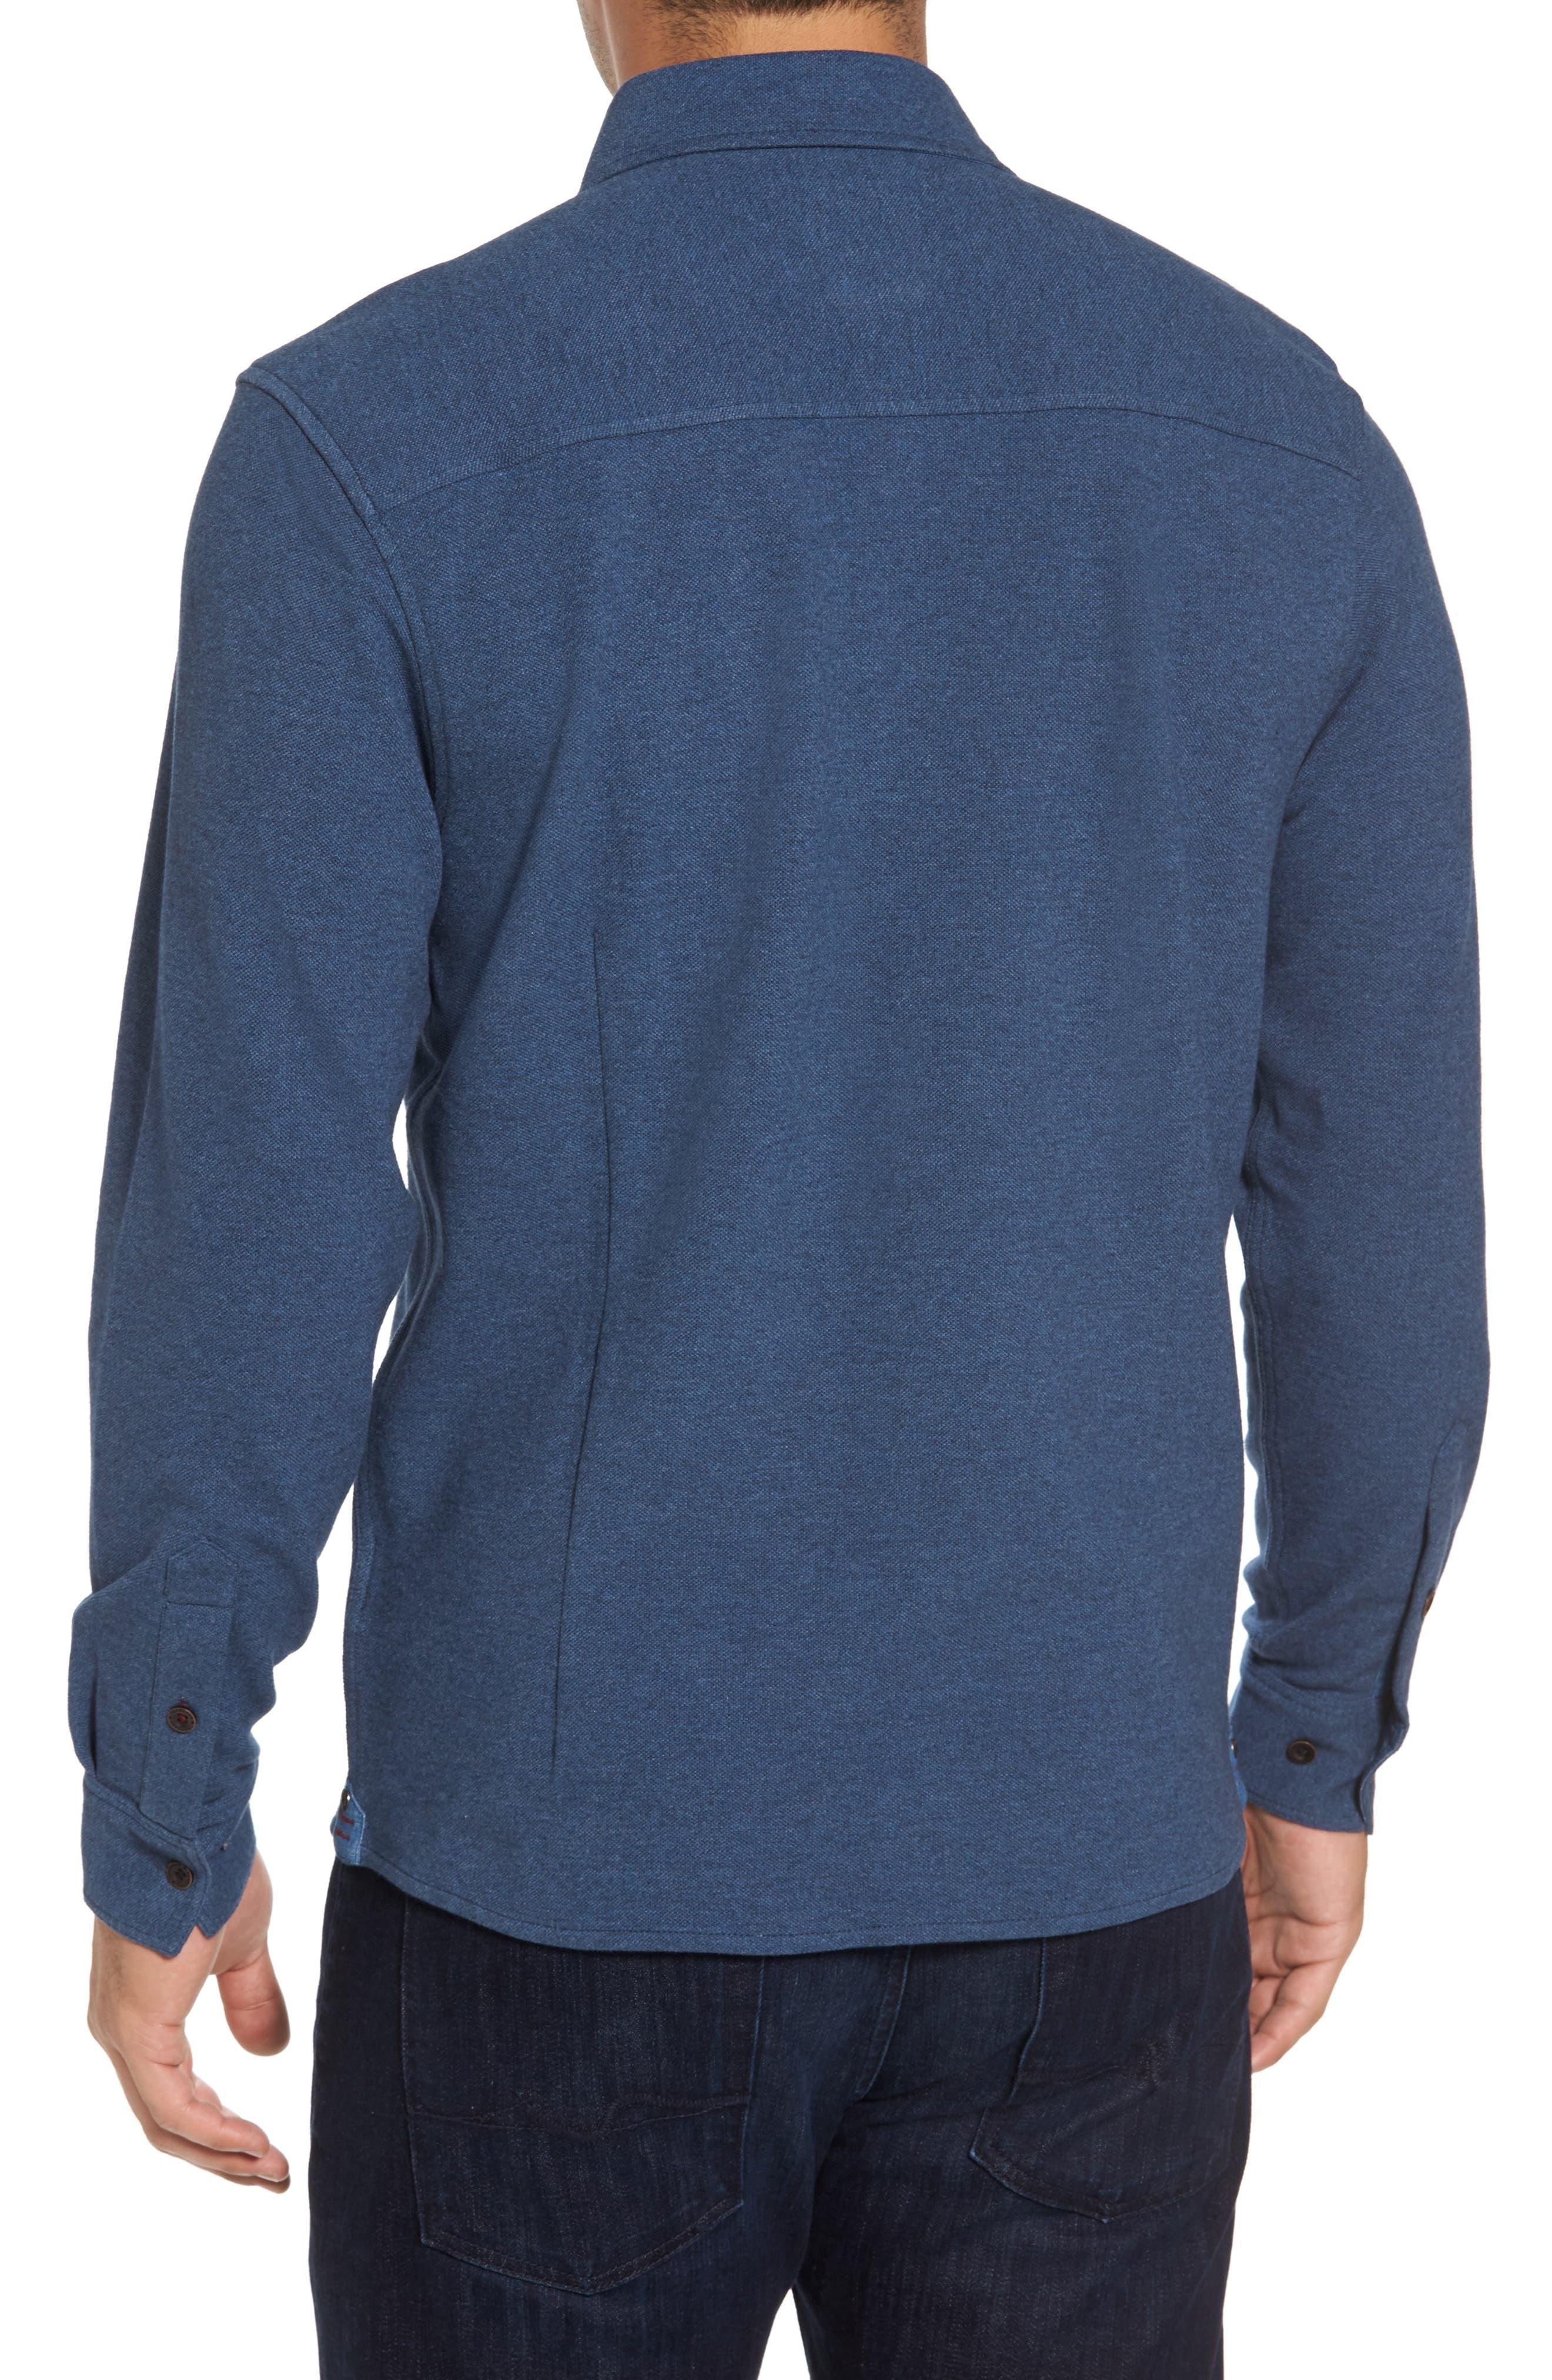 Shandy Heathered Knit Sport Shirt,                             Alternate thumbnail 4, color,